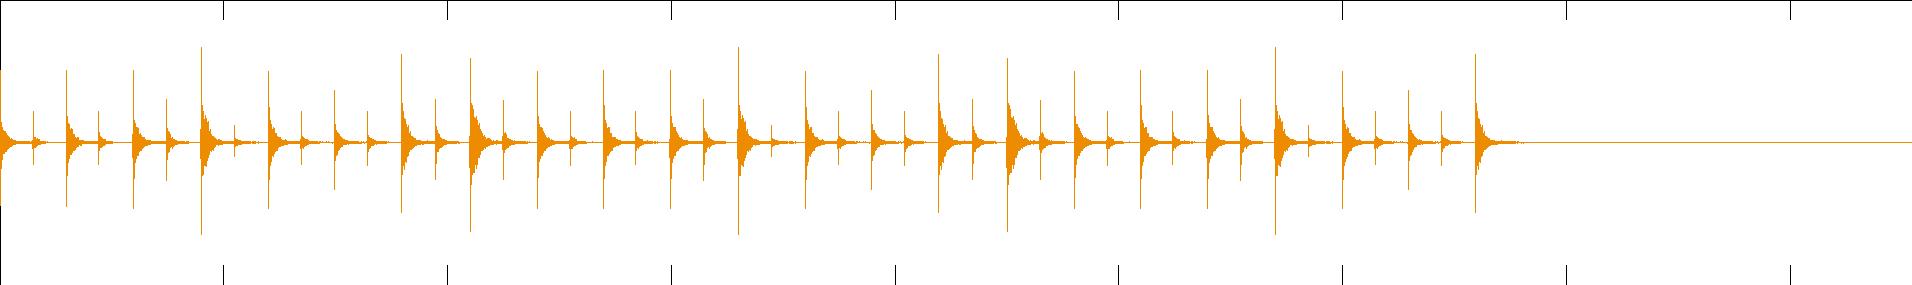 WaveDrum02_42_HH